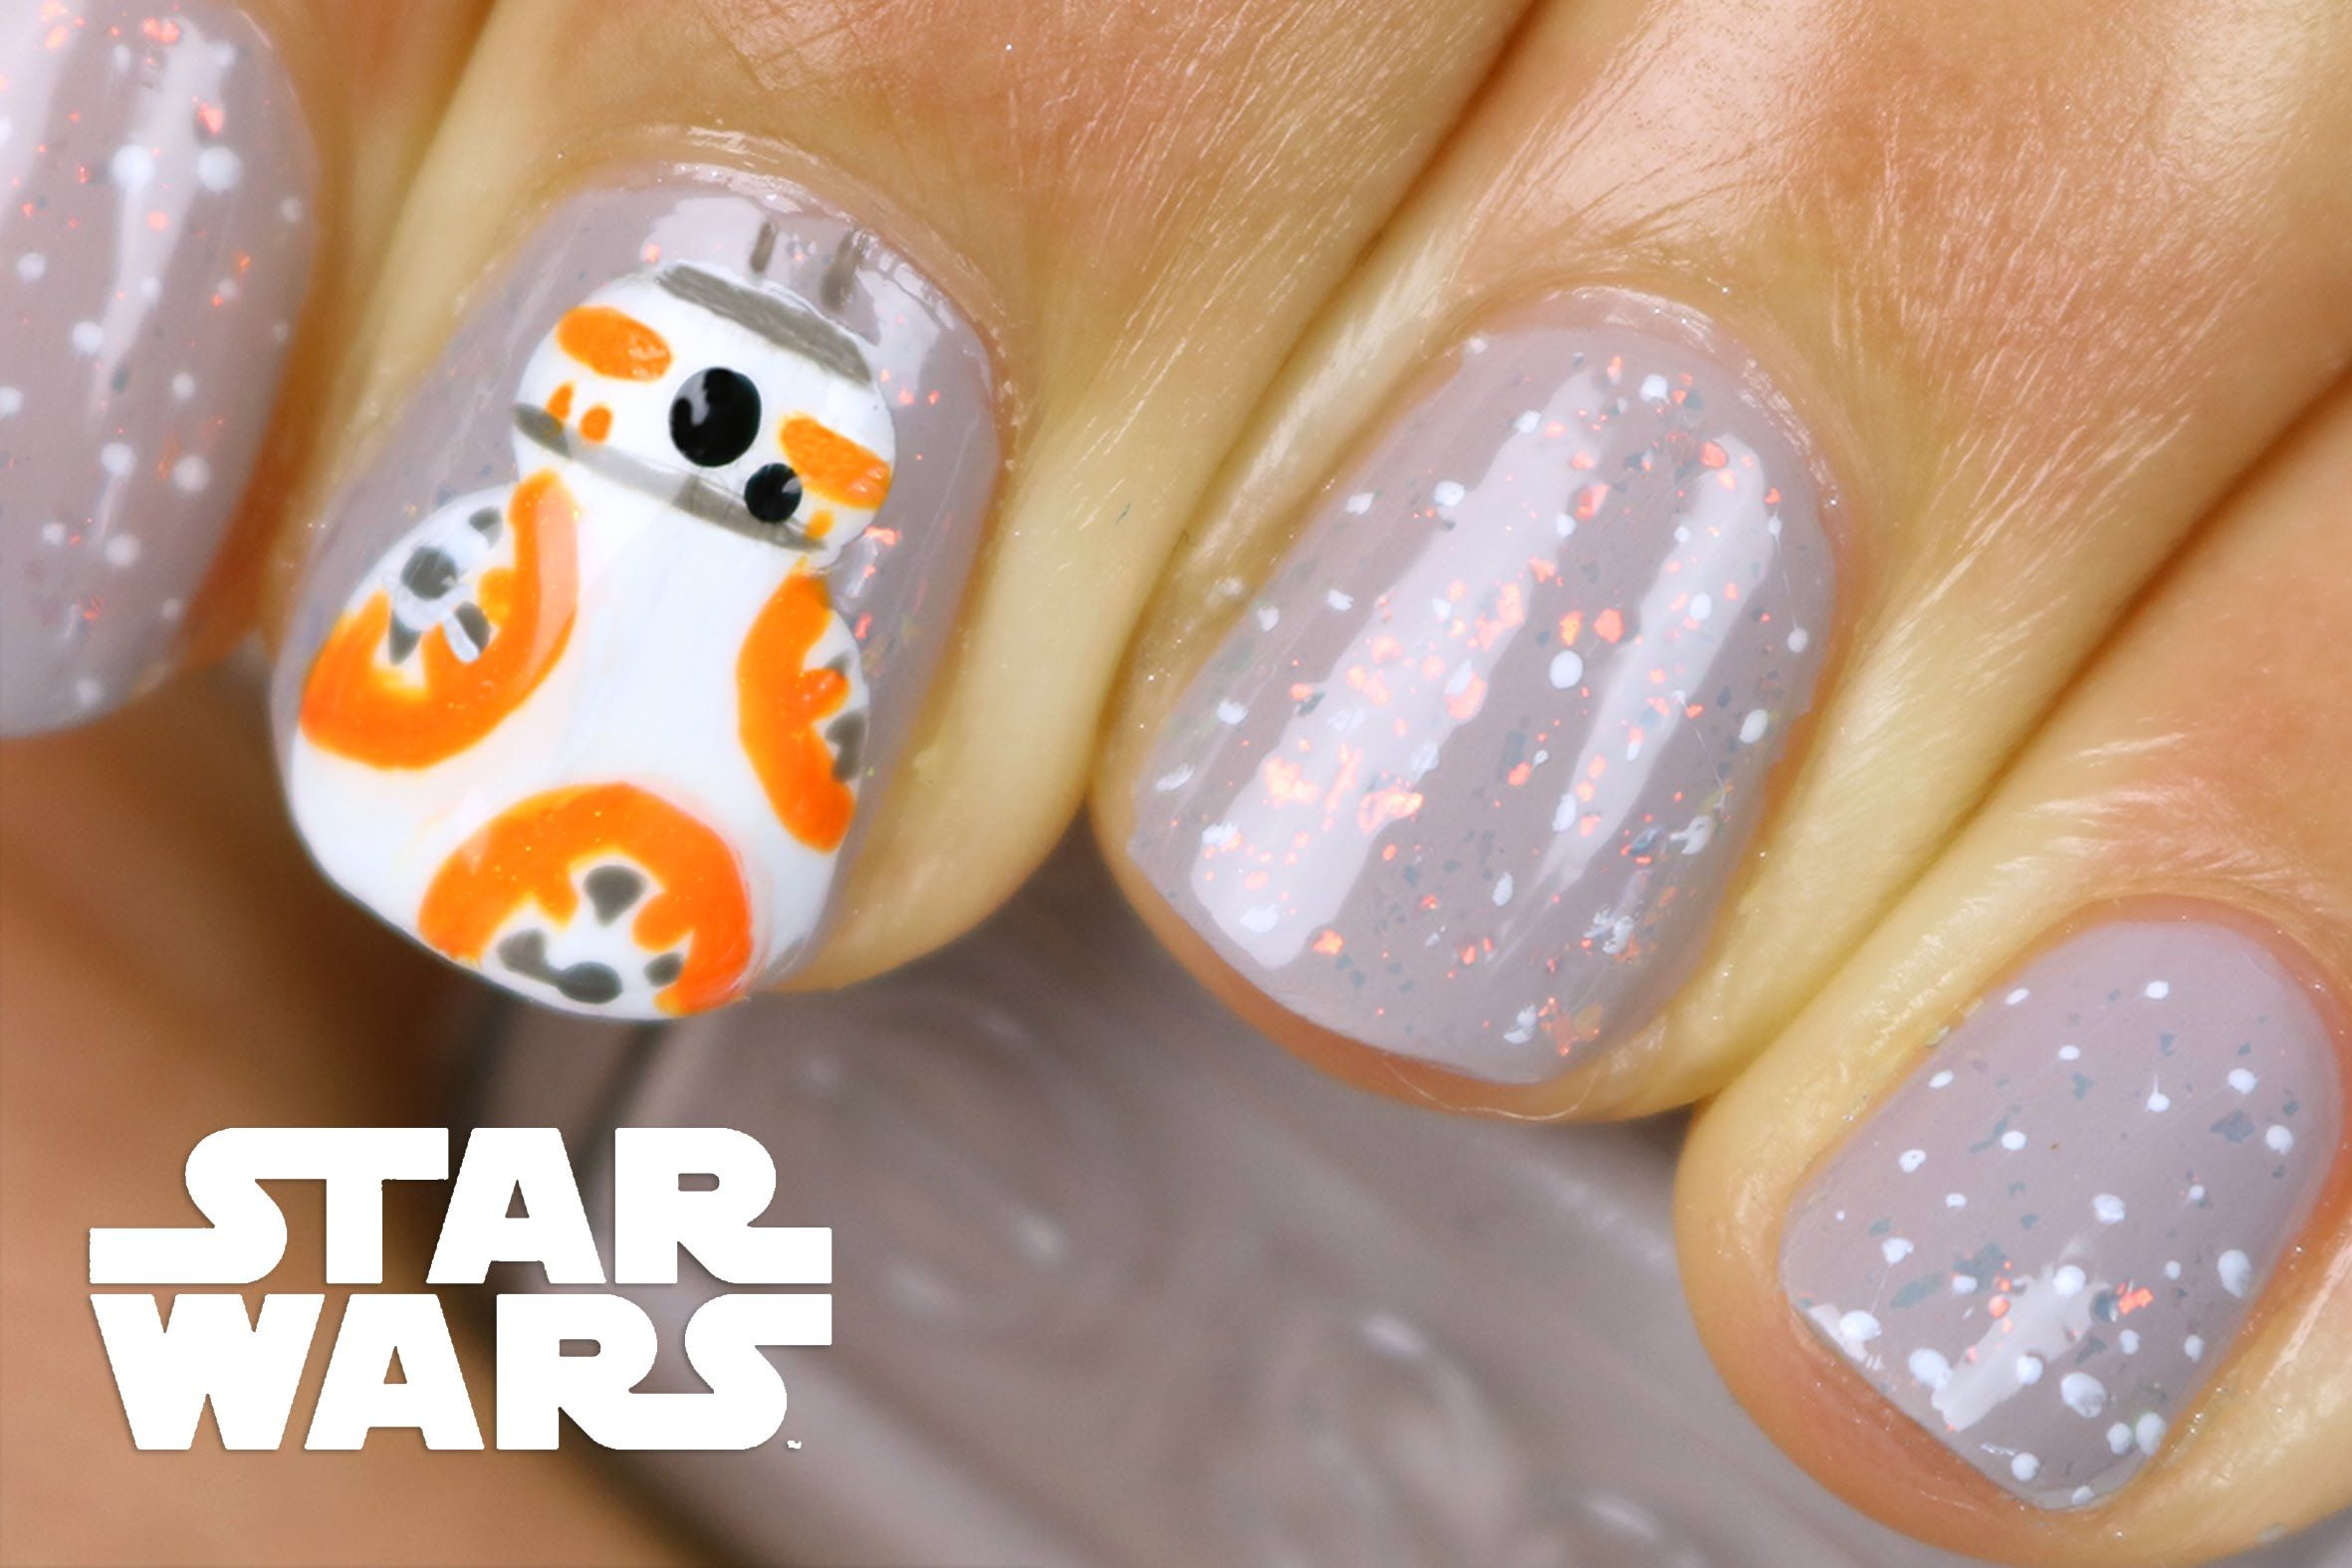 BB-8 Star Wars nailart | Nail & Hand Art & Designs | Pinterest ...